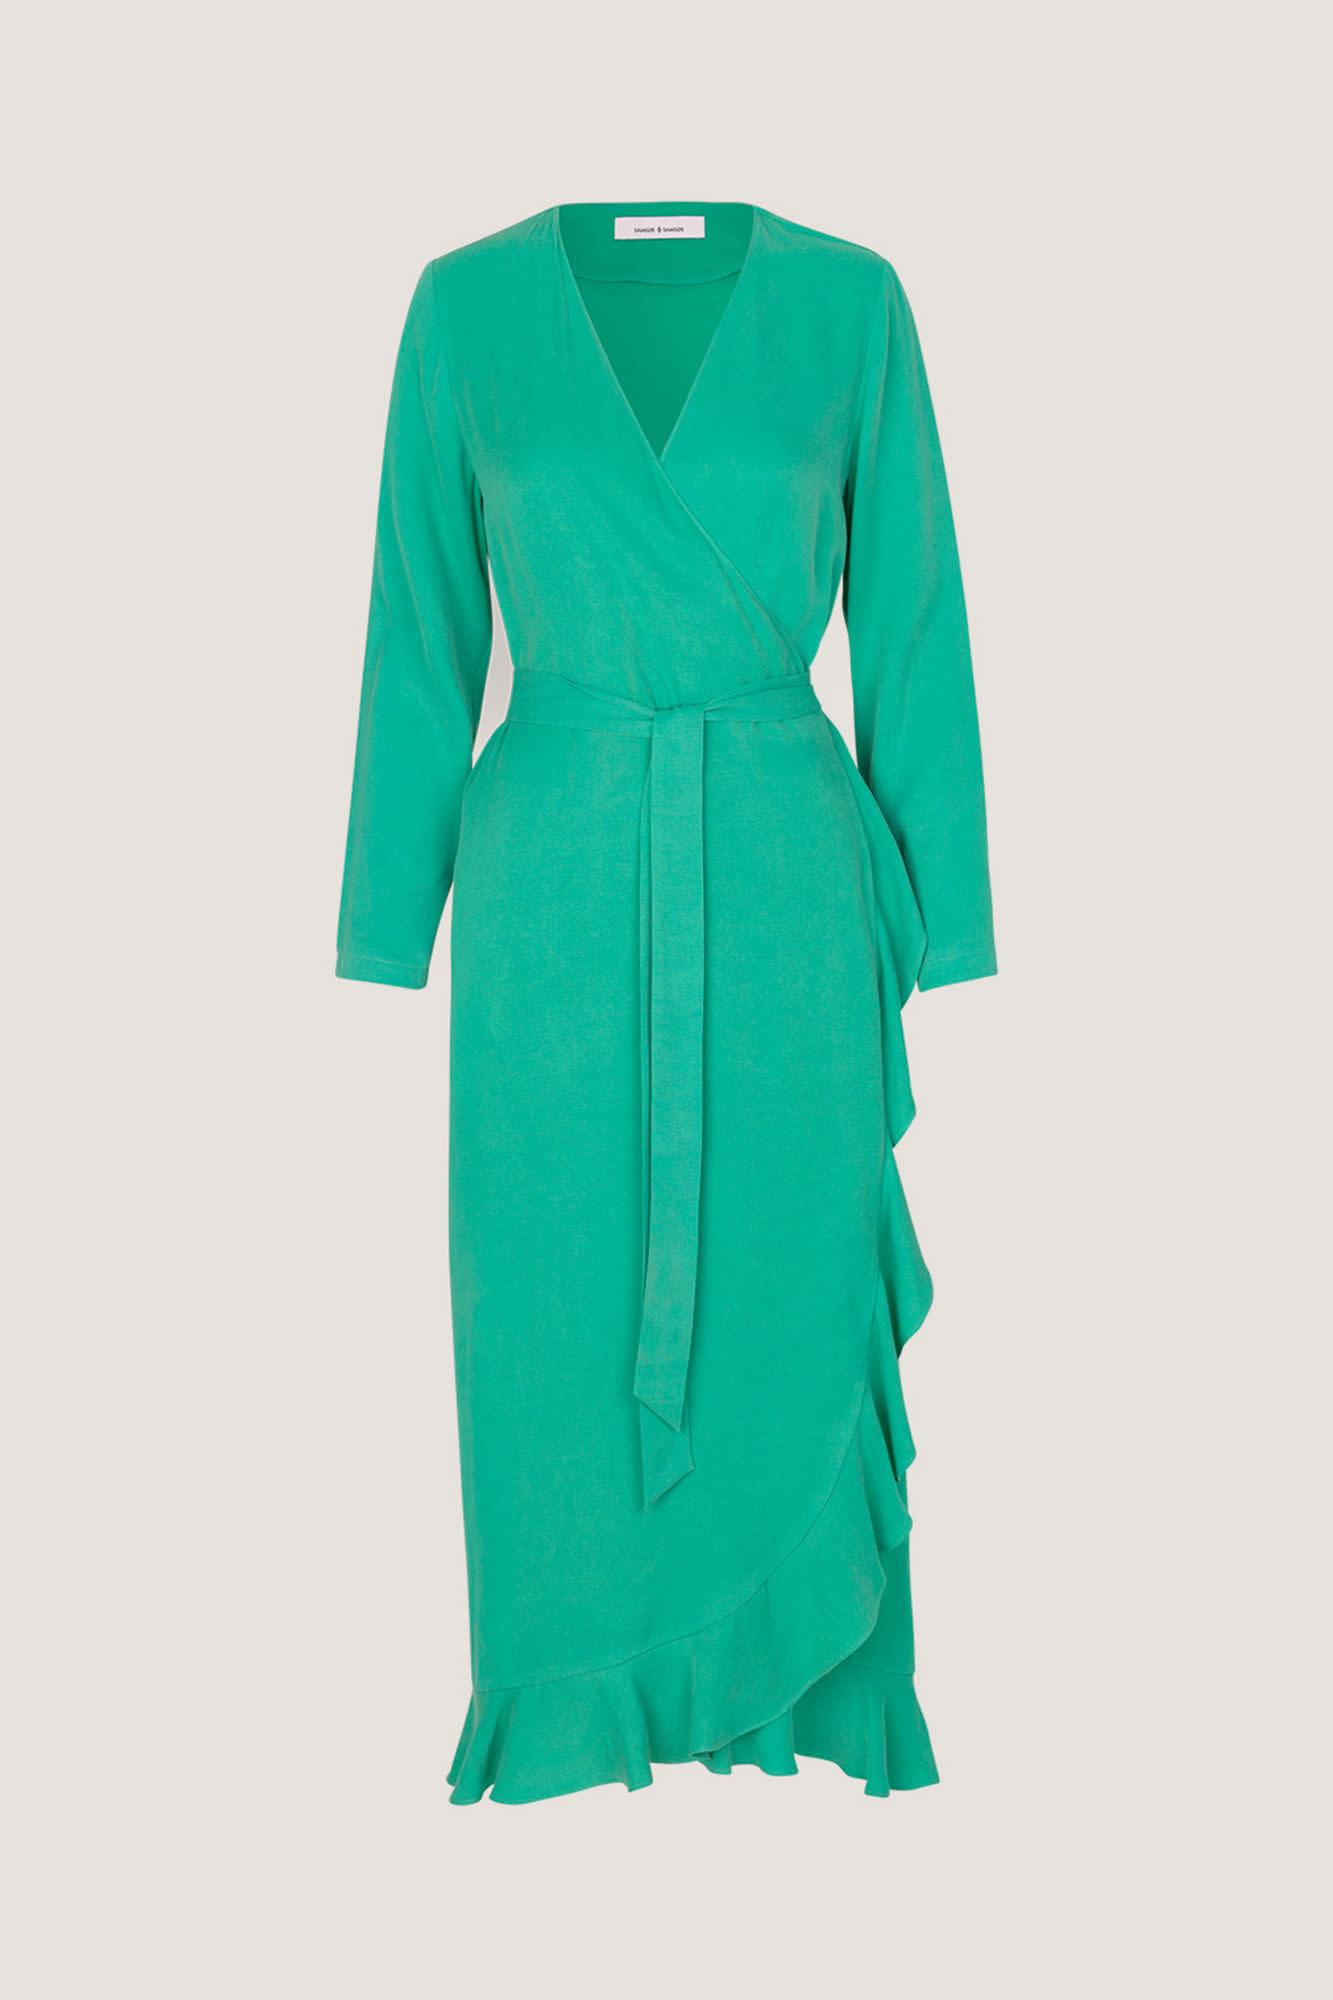 Limon L dress Samsoe Samsoe-2